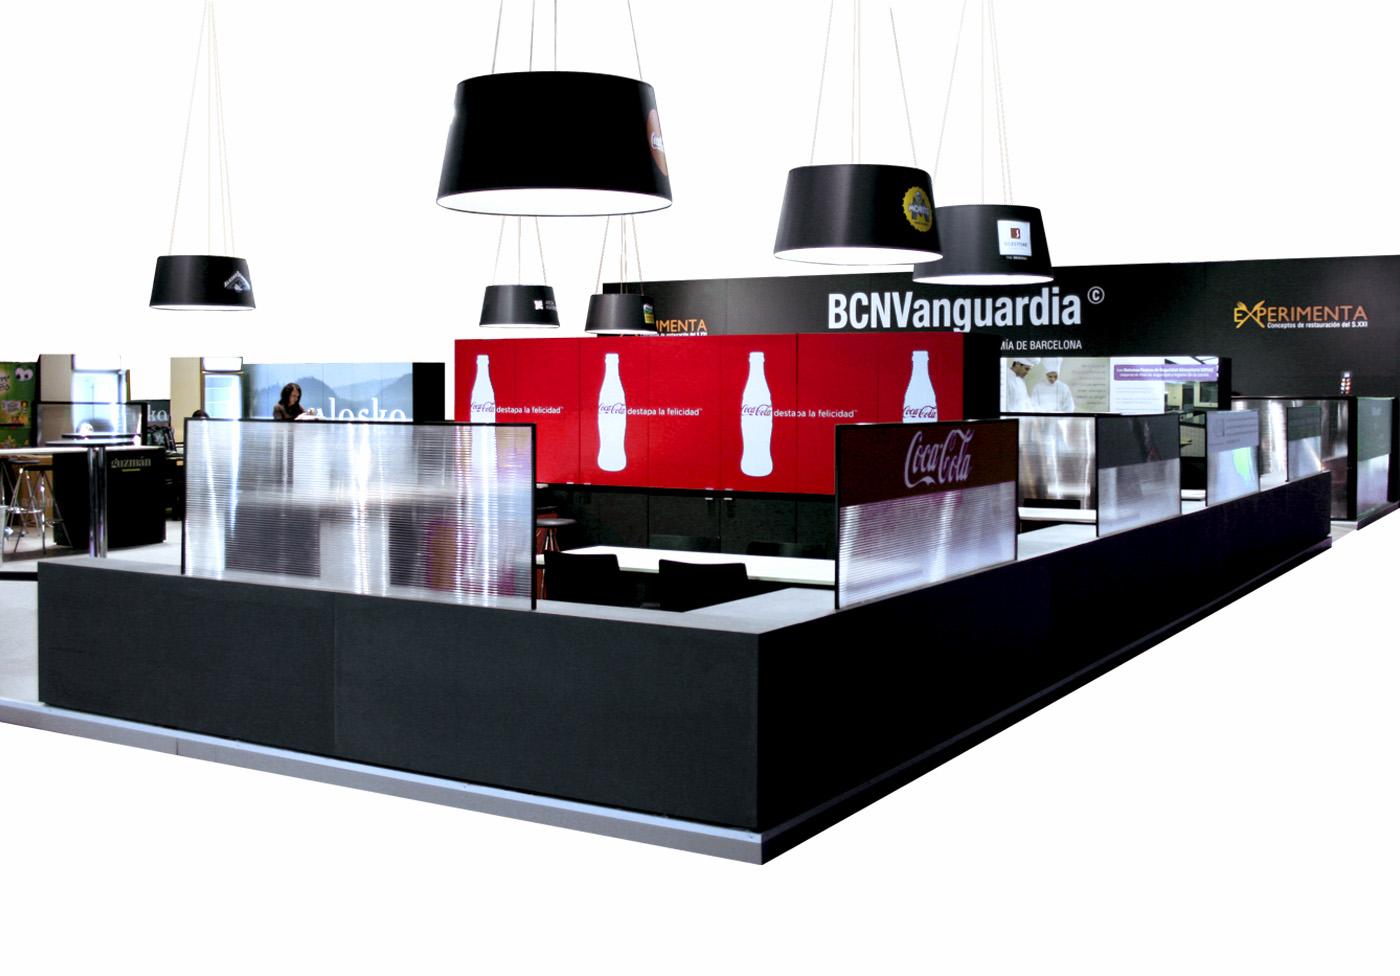 disseny-espai-BCNVanguardia-alimentaria-gastronomia-cheff-evento-stand-creartiva